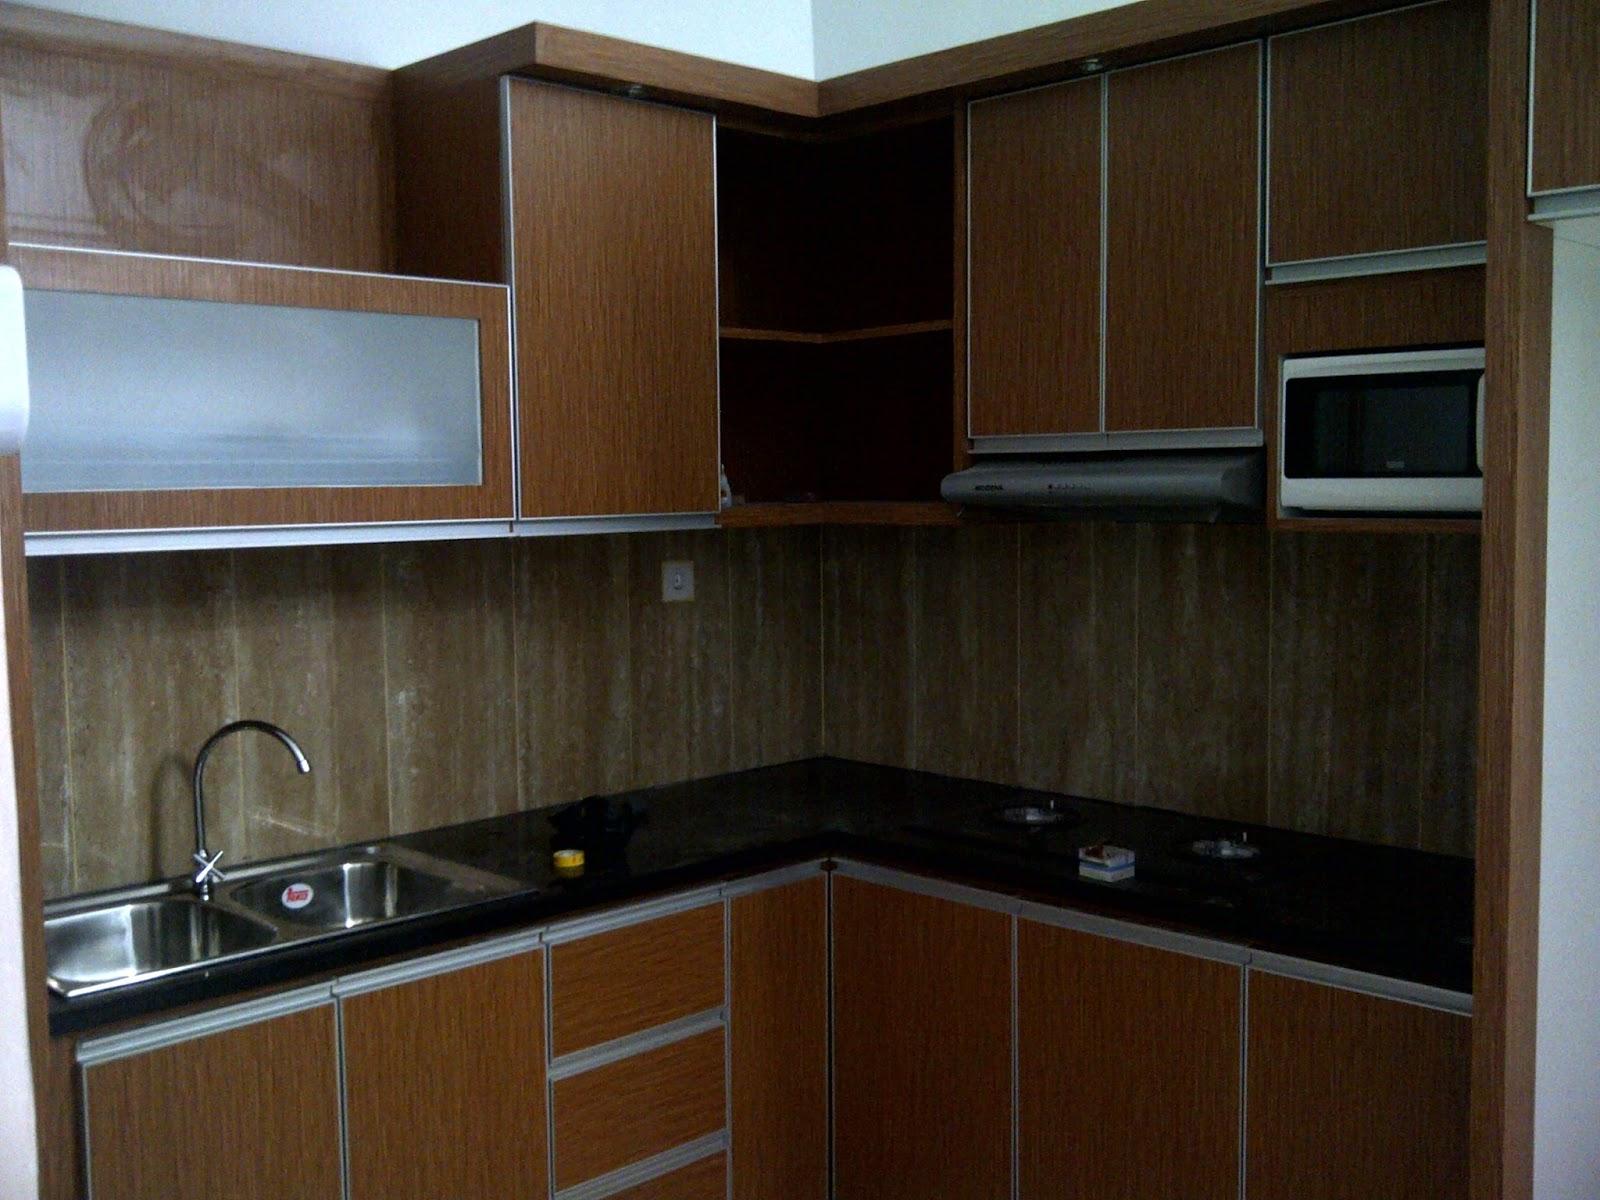 Jasa pembuatan kitchen set dapur rumah minimalis for Kitchen dapur